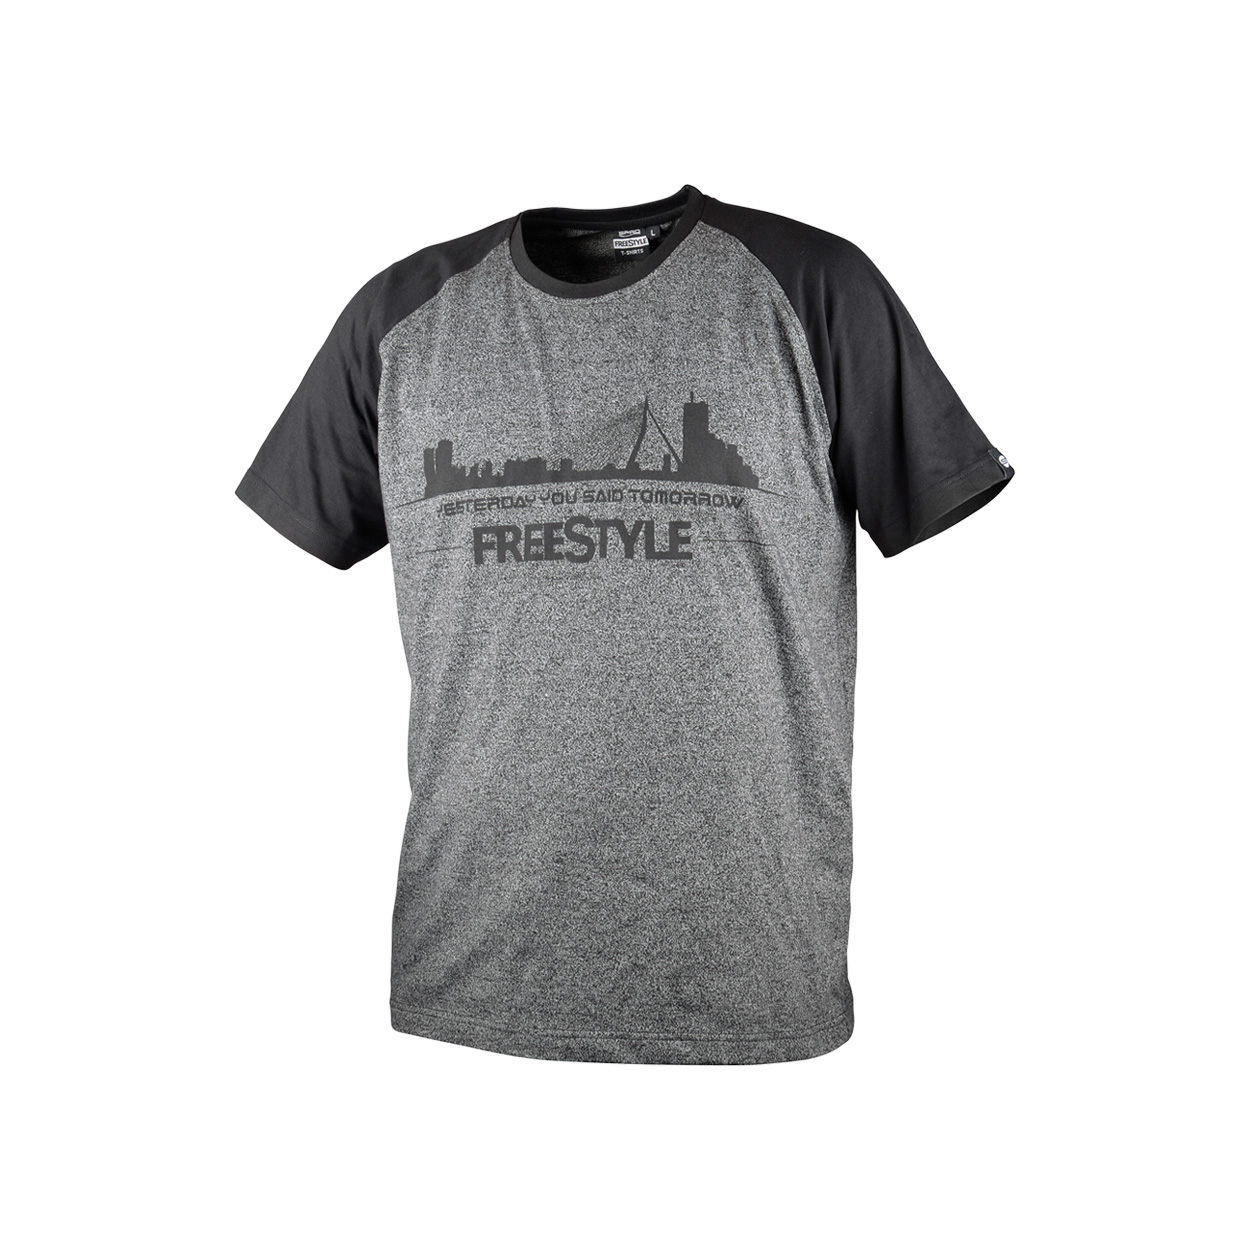 Freestyle - T-Shirt - Grey 01